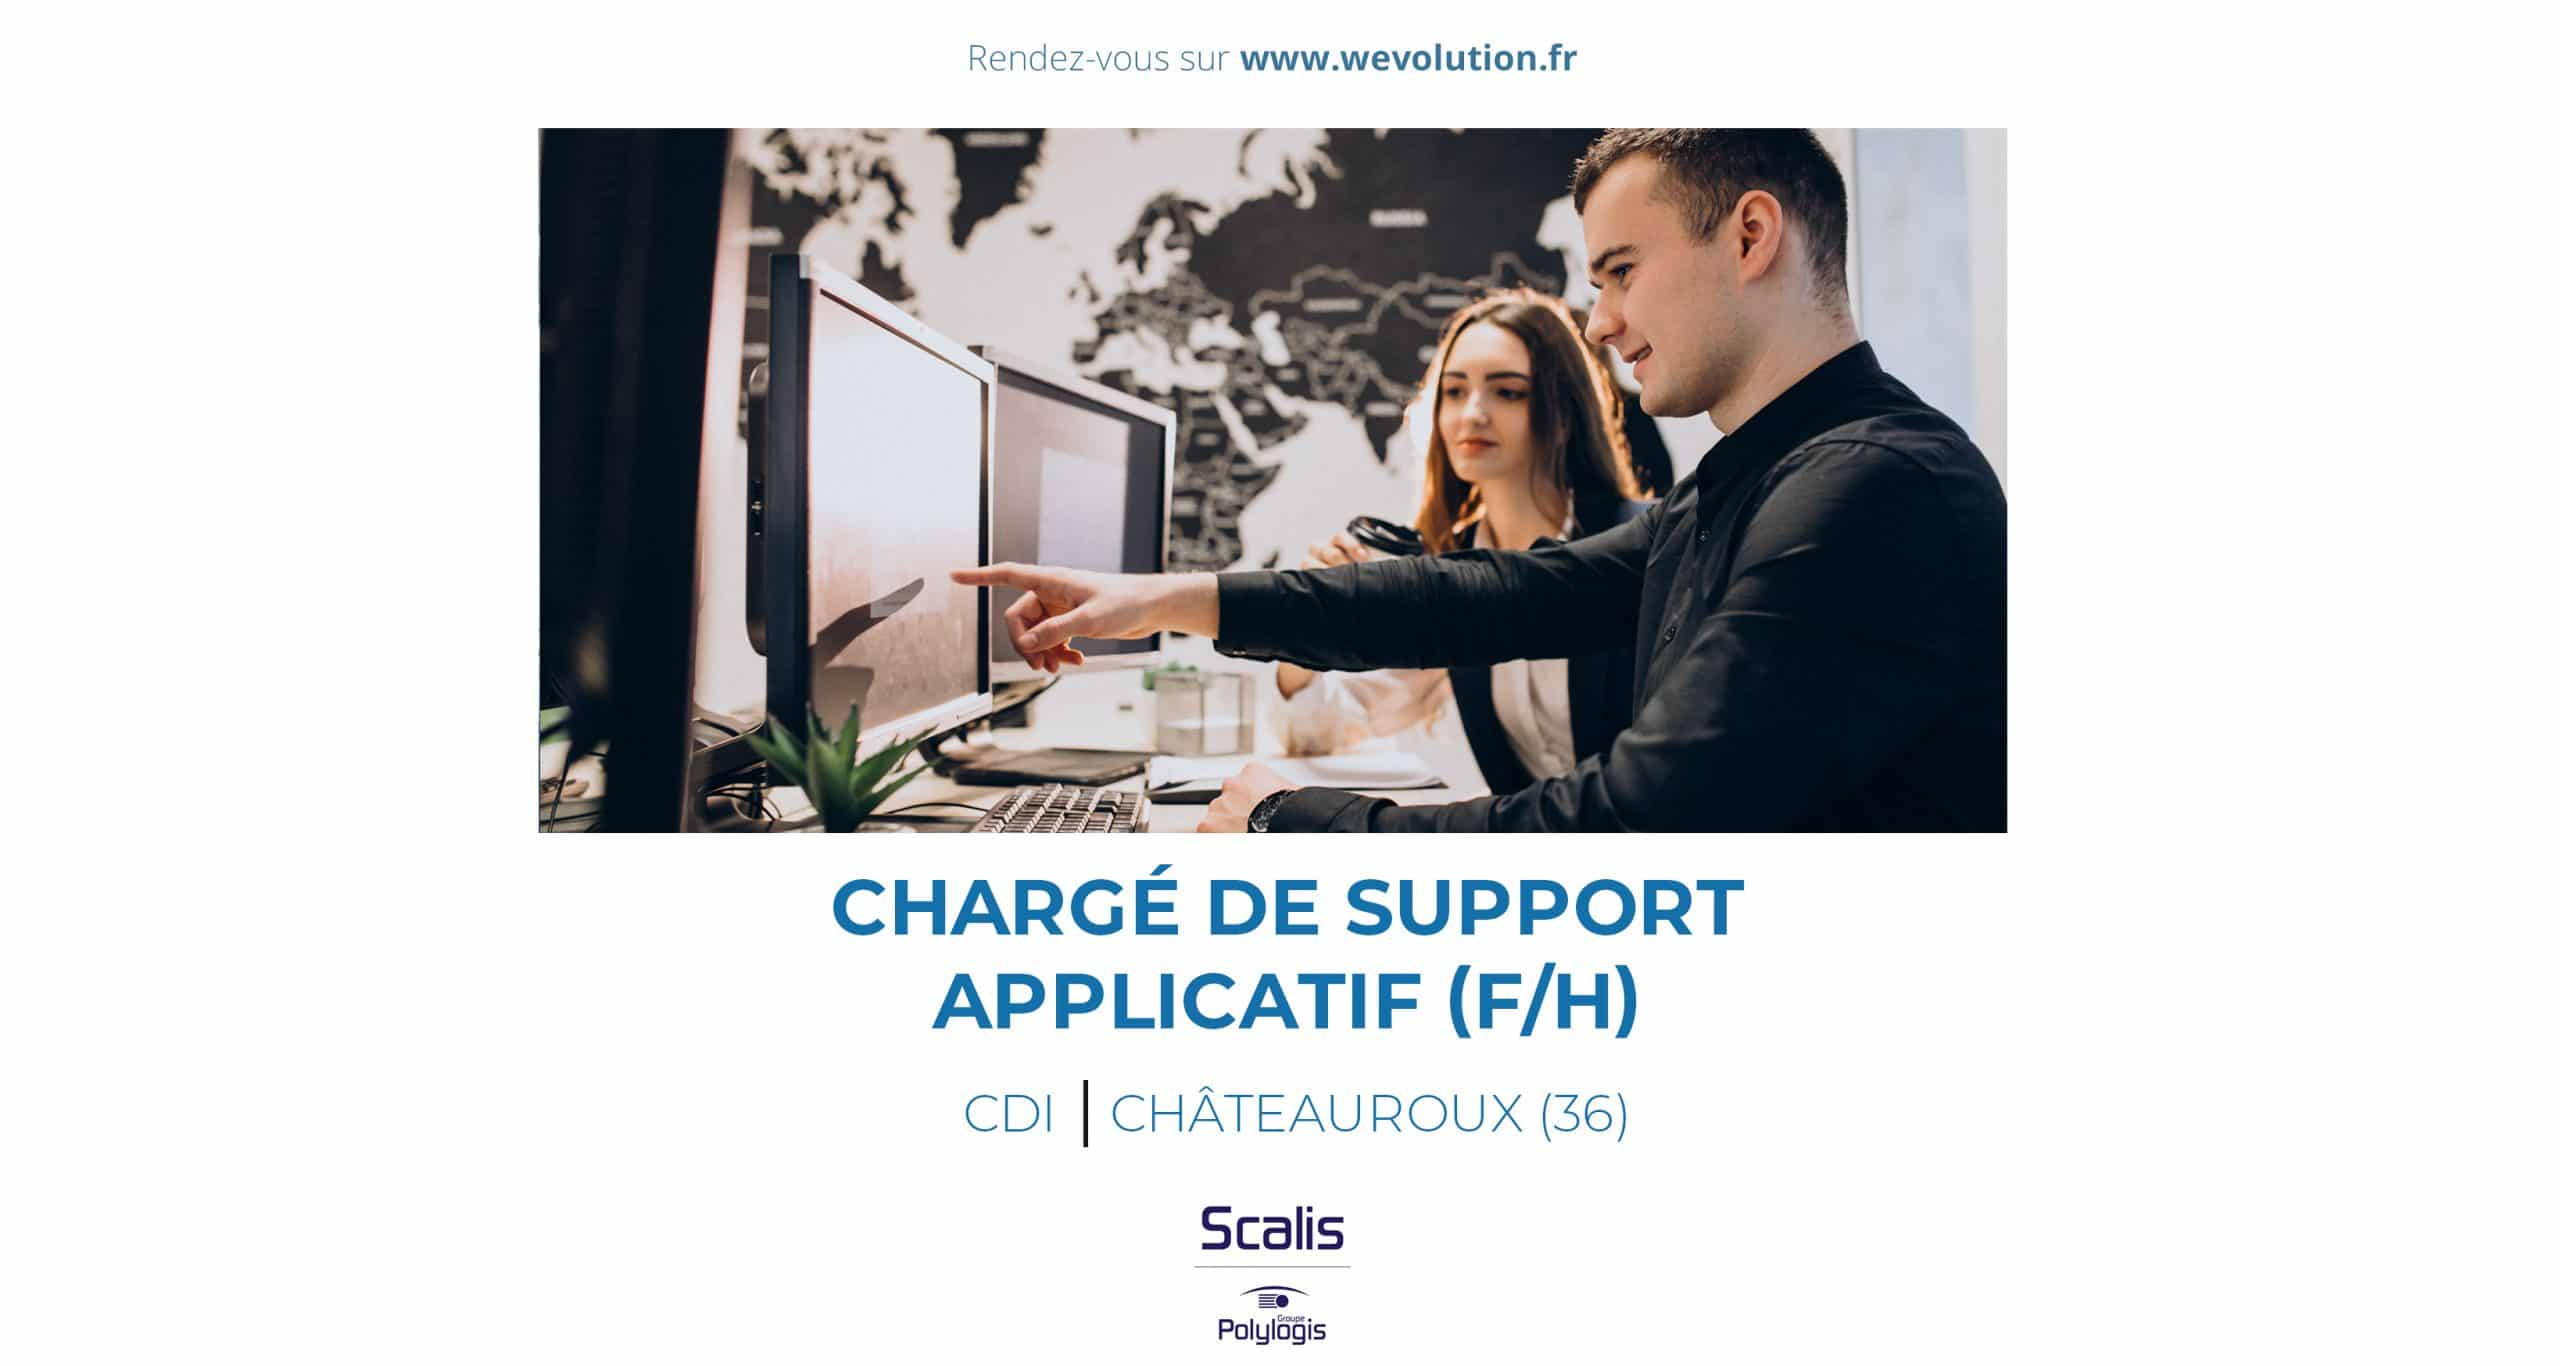 CHARGE DE SUPPORT APPLICATIF (F/H) – scalis / polylogis